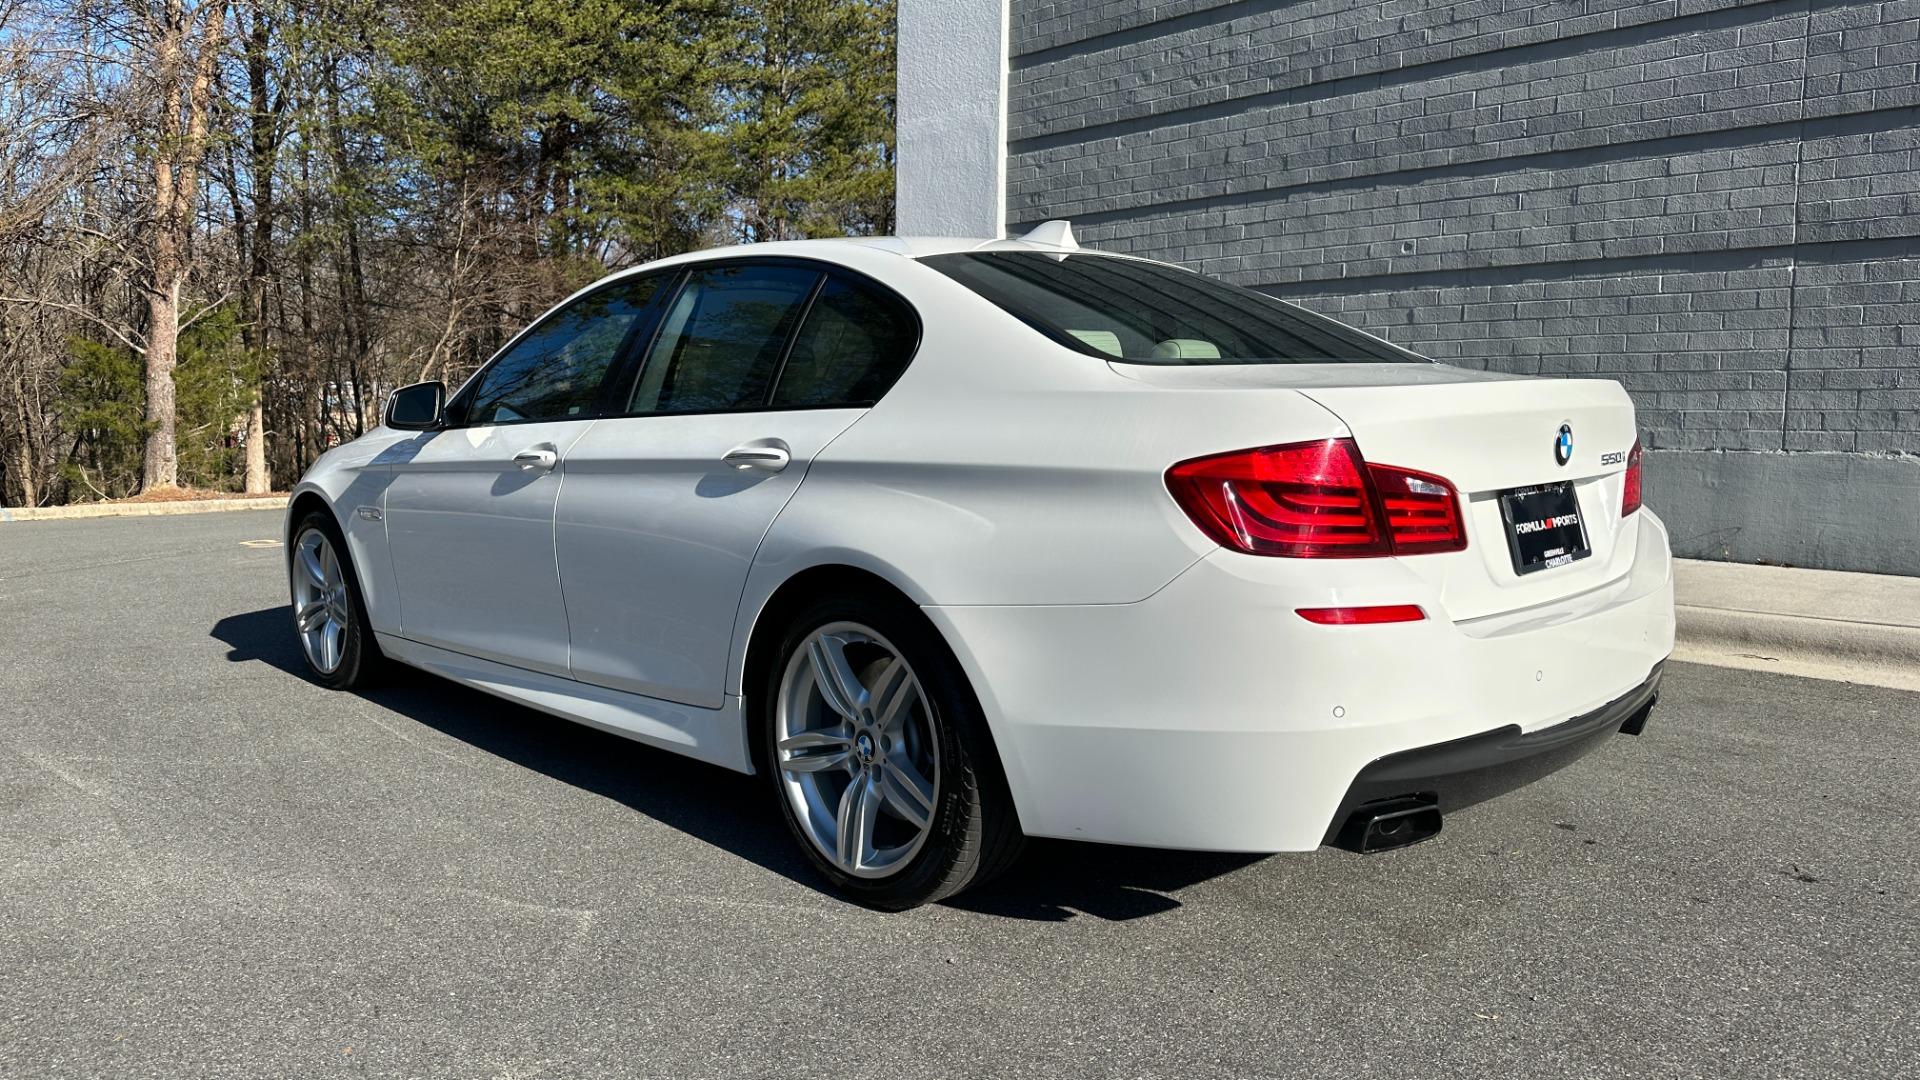 Used 2012 BMW 5 SERIES 550I M SPORT / NAV / CONV PKG / SUNROOF / PREM SND / REARVIEW for sale Sold at Formula Imports in Charlotte NC 28227 4